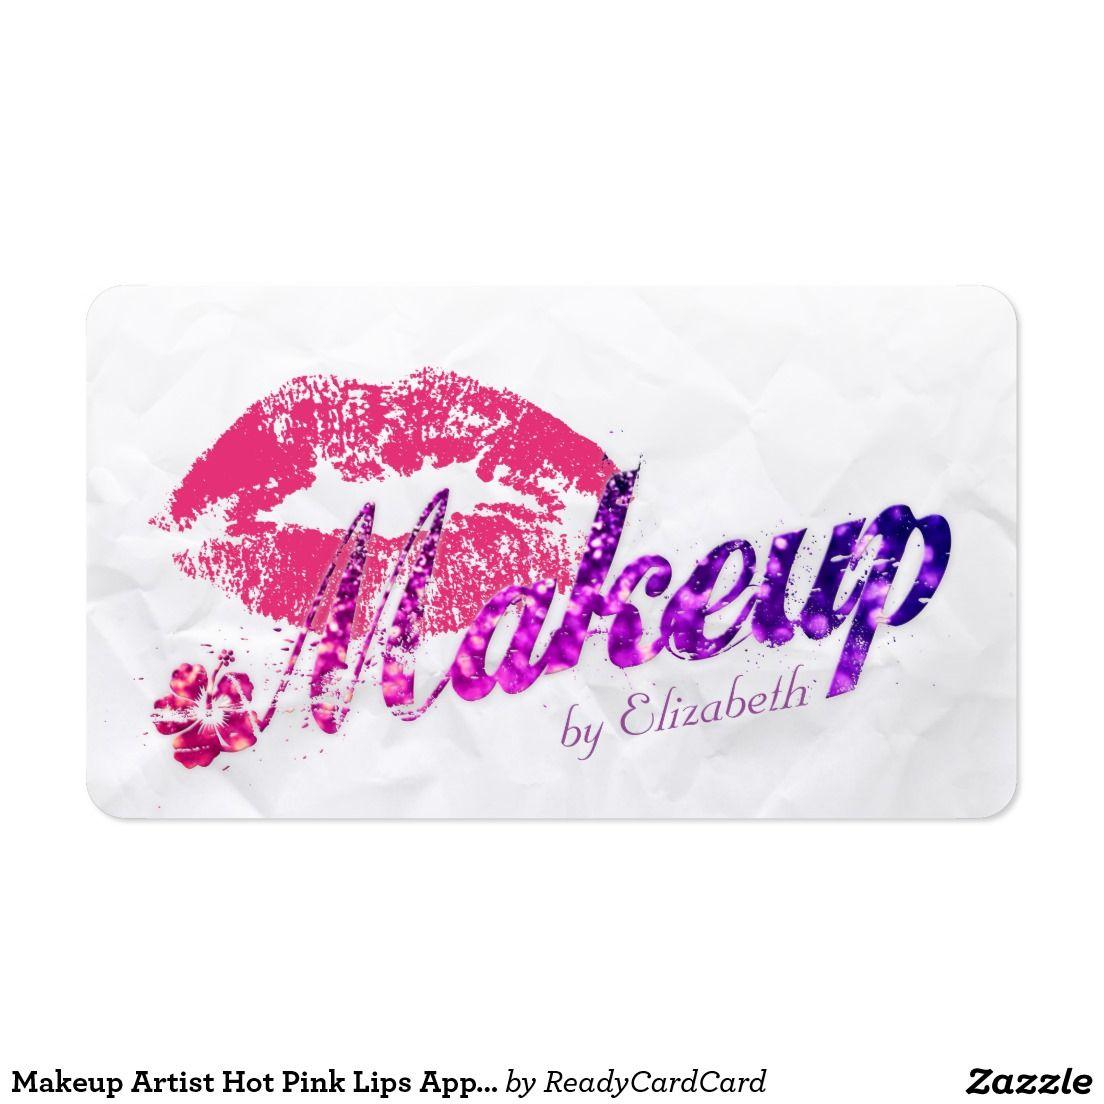 Makeup Artist Hot Pink Lips Appointment Business Card   MAKEUP ...